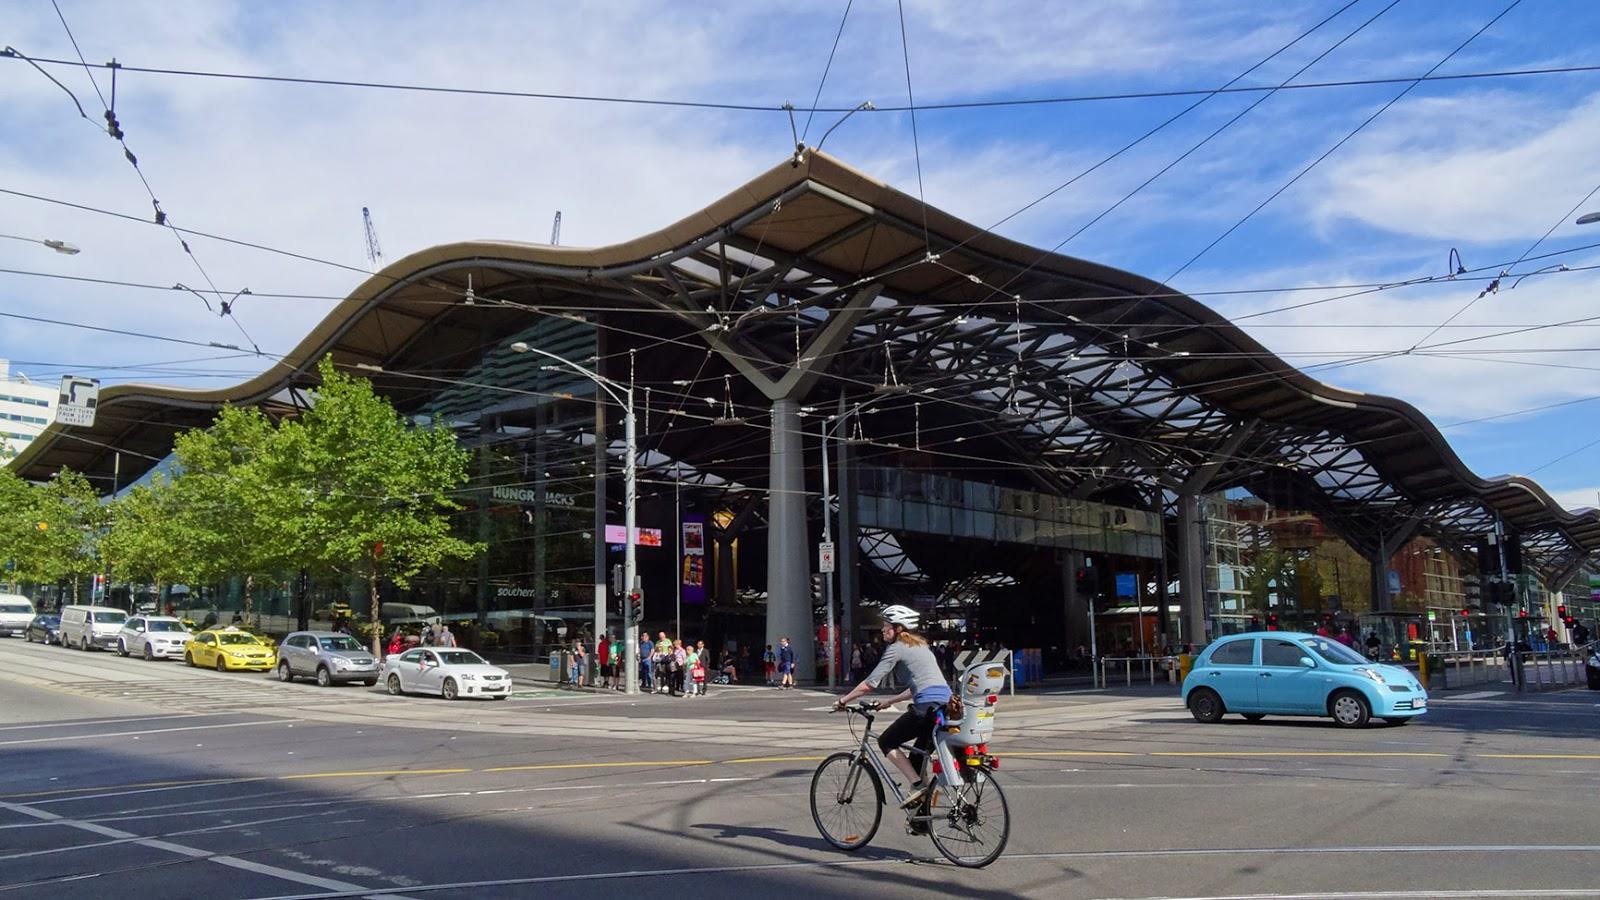 southern cross station - photo #36